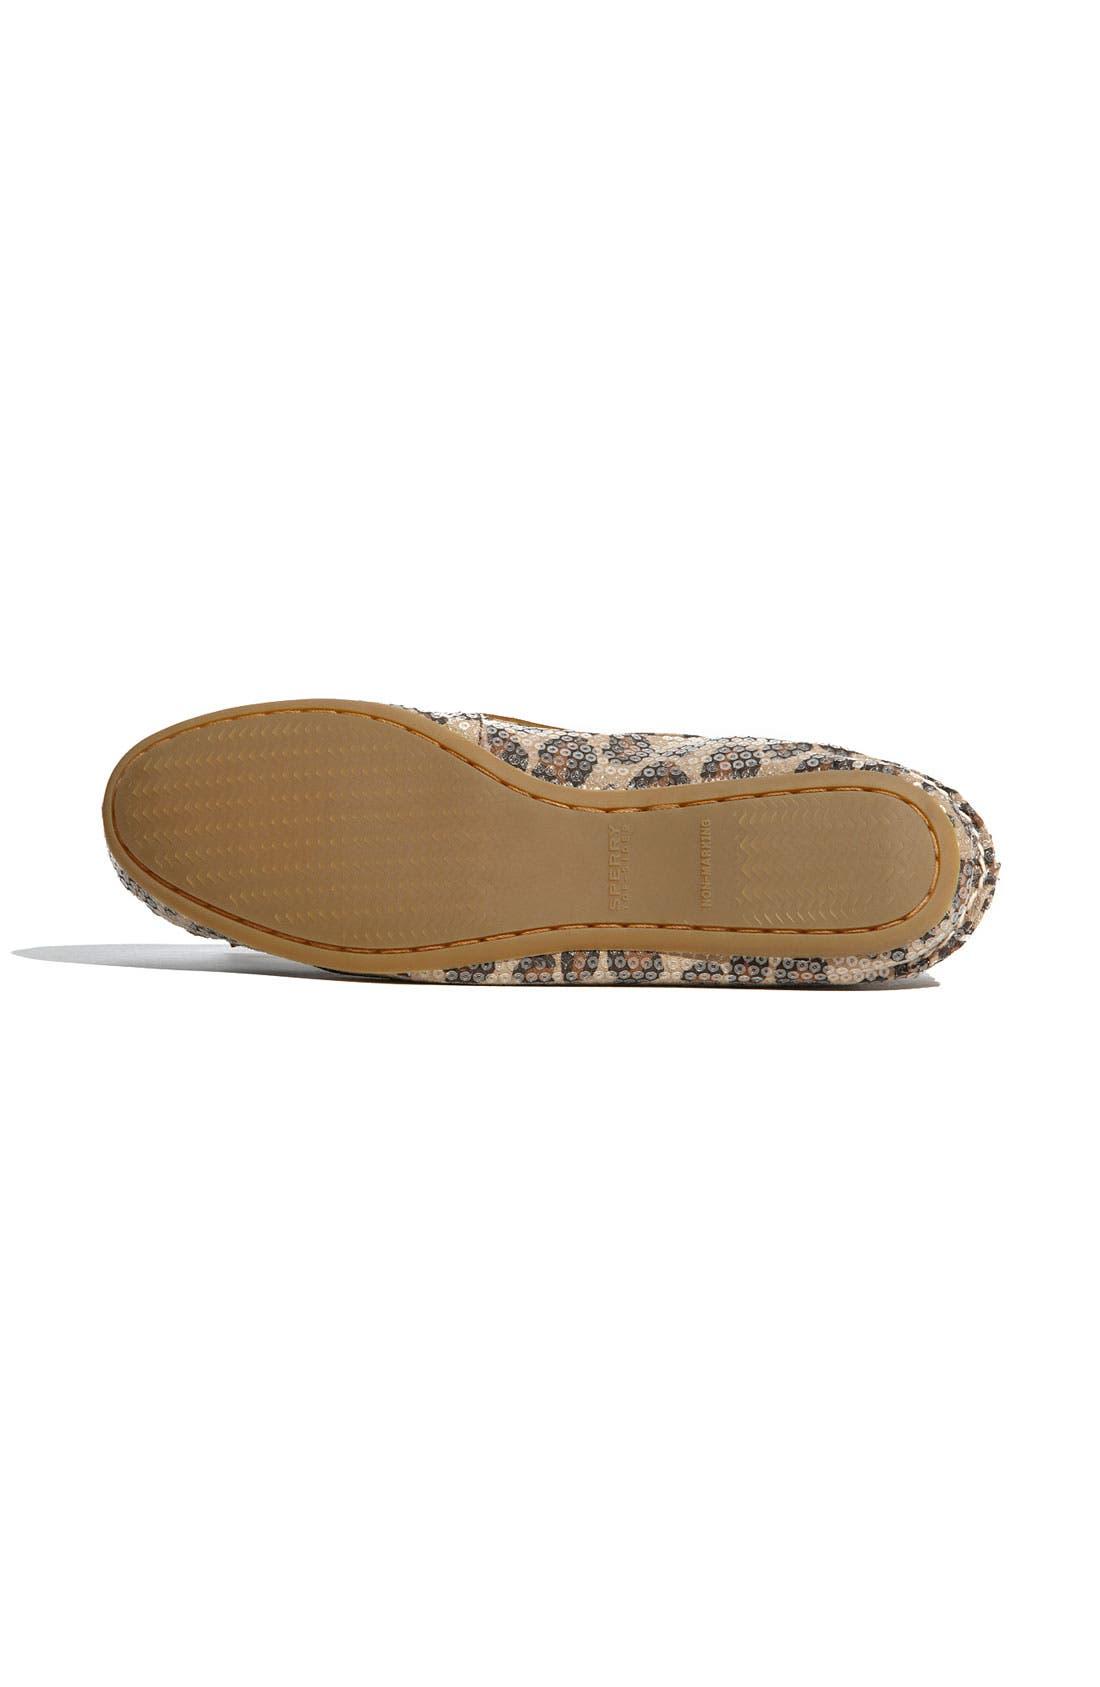 Top-Sider<sup>®</sup> 'Skiff' Moccasin Slip-On,                             Alternate thumbnail 4, color,                             Leopard Sequins